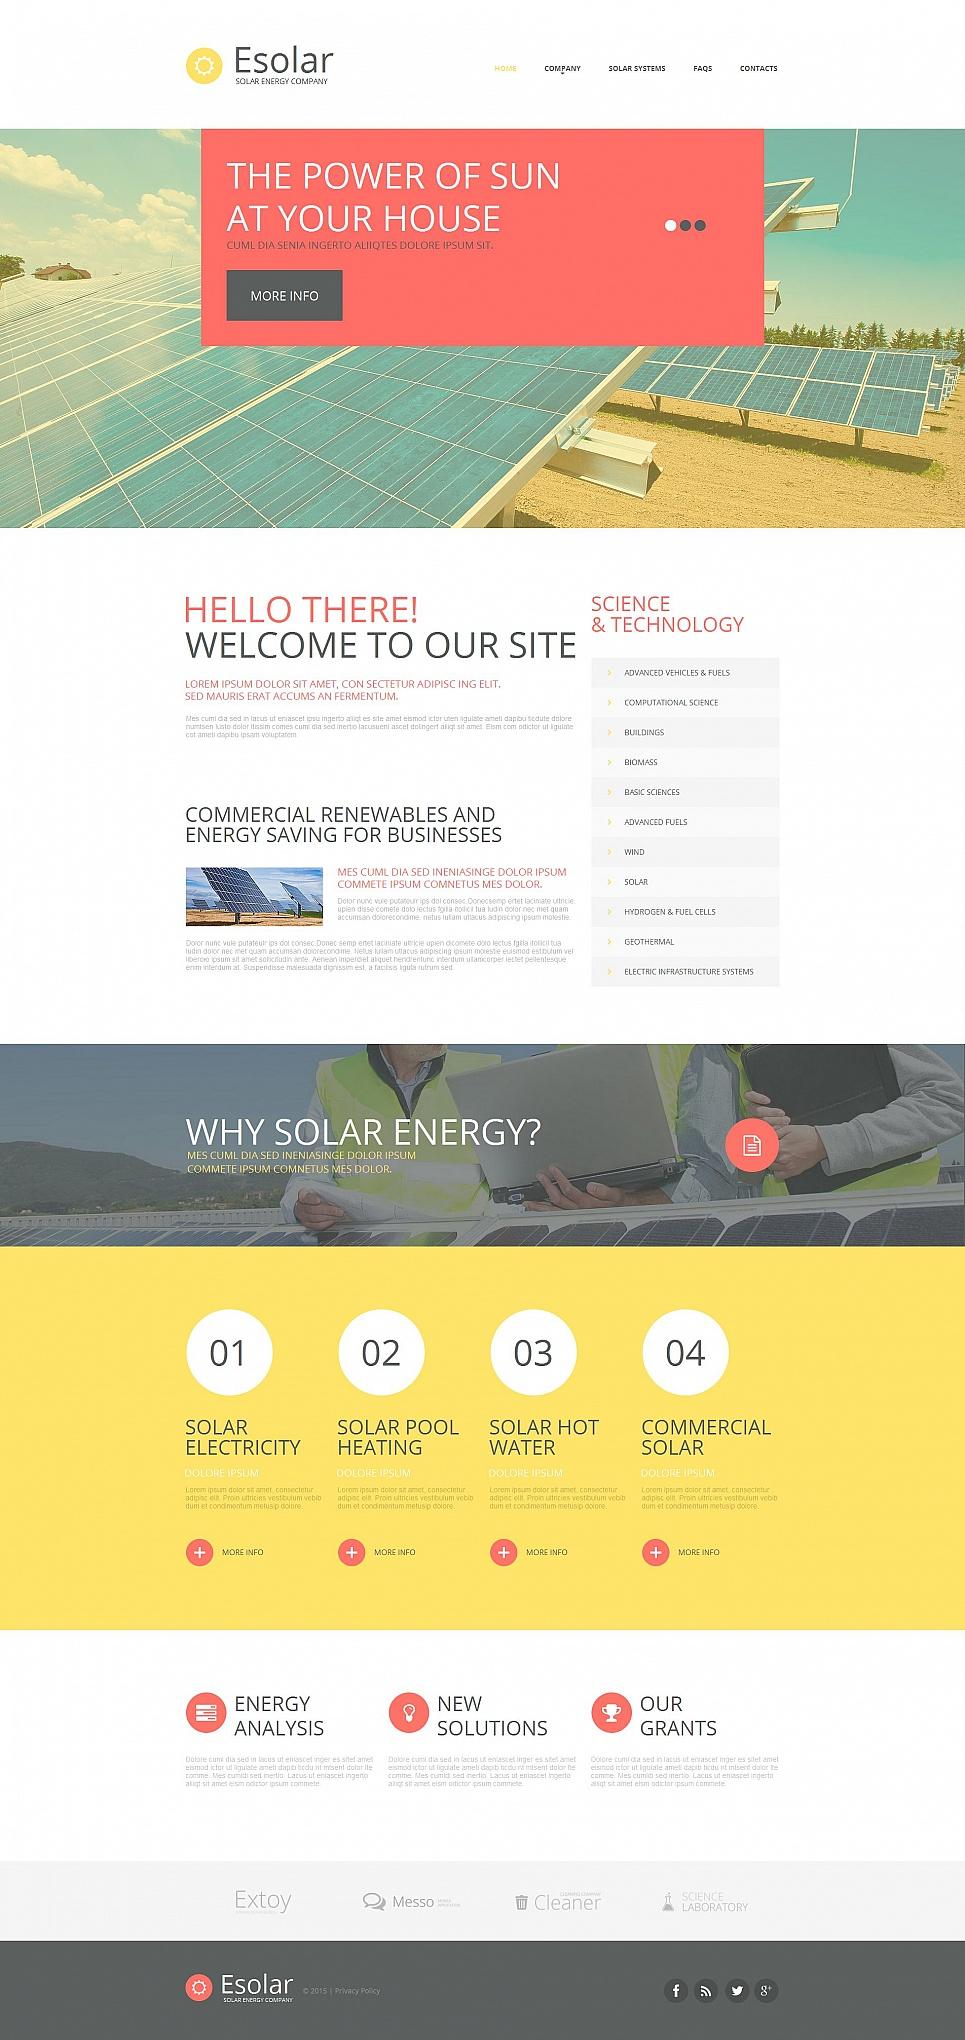 MotoCMS HTML Szablon #54916 z kategorii Energia Alternatywna - image